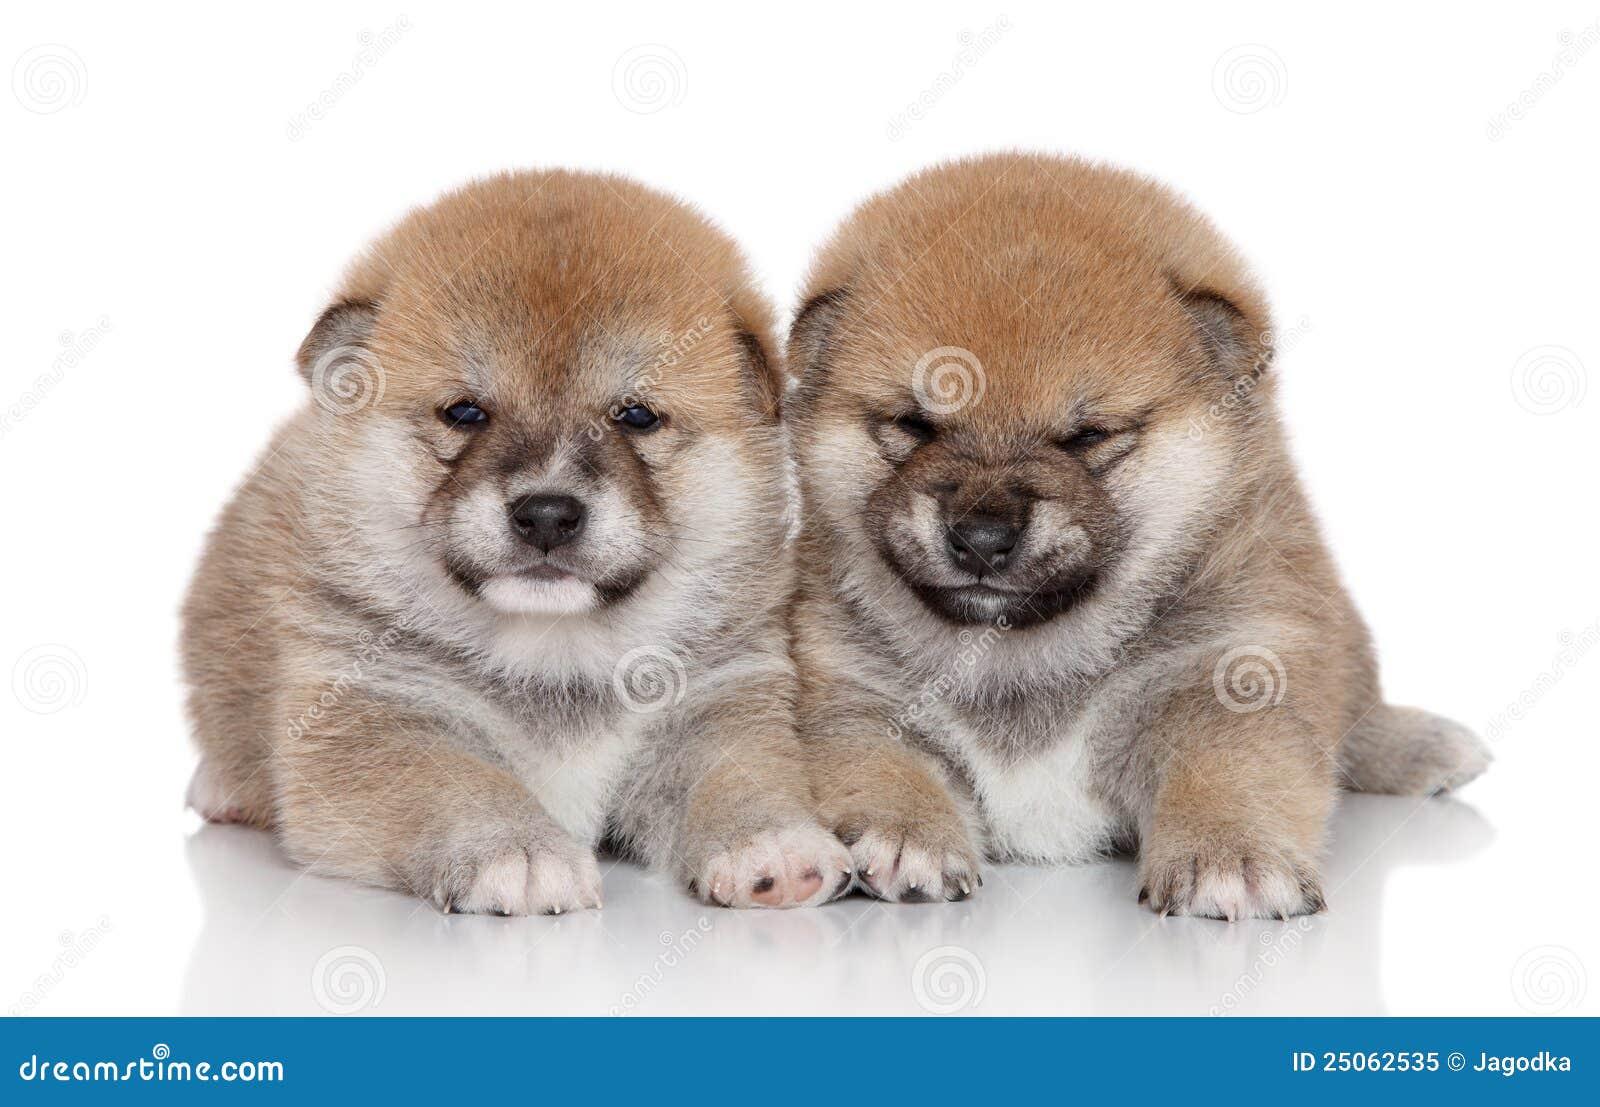 Shiba Inu Puppies Royalty Free Stock Photo - Image: 25062535